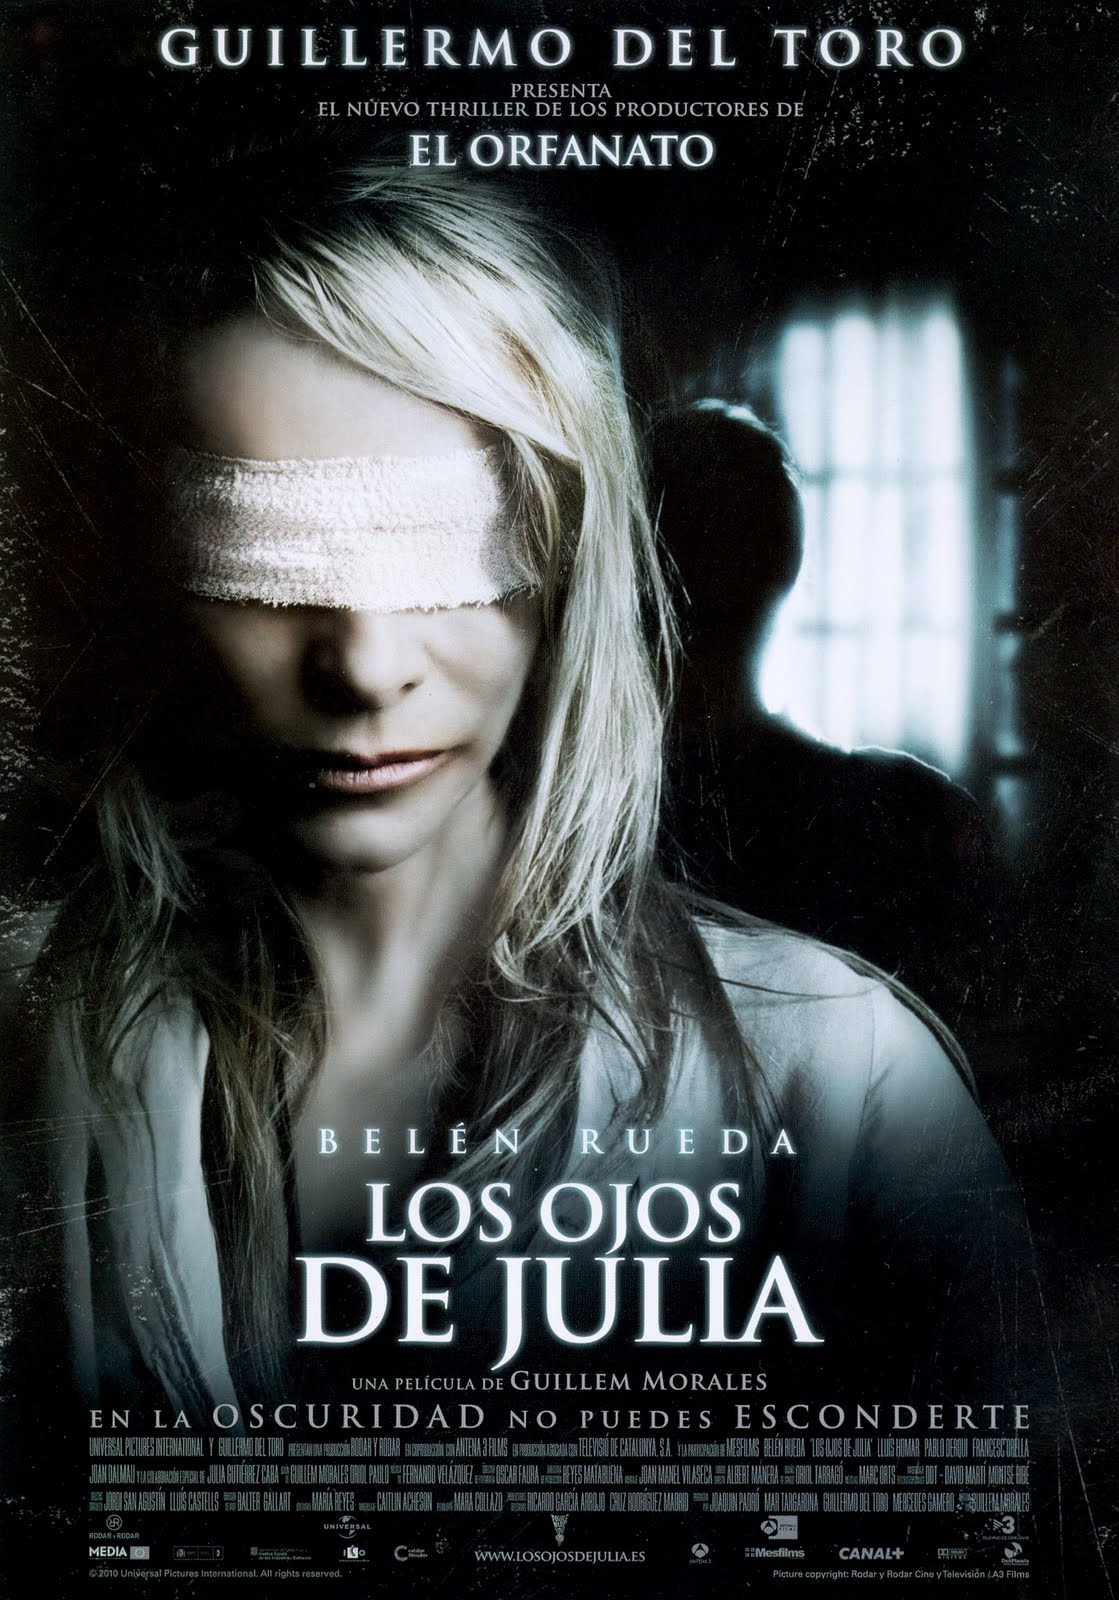 http://2.bp.blogspot.com/_-eq3eKYVBe0/TNhj3maz5EI/AAAAAAAAAGE/tIm83Hncub4/s1600/Los_Ojos_De_Julia.jpg